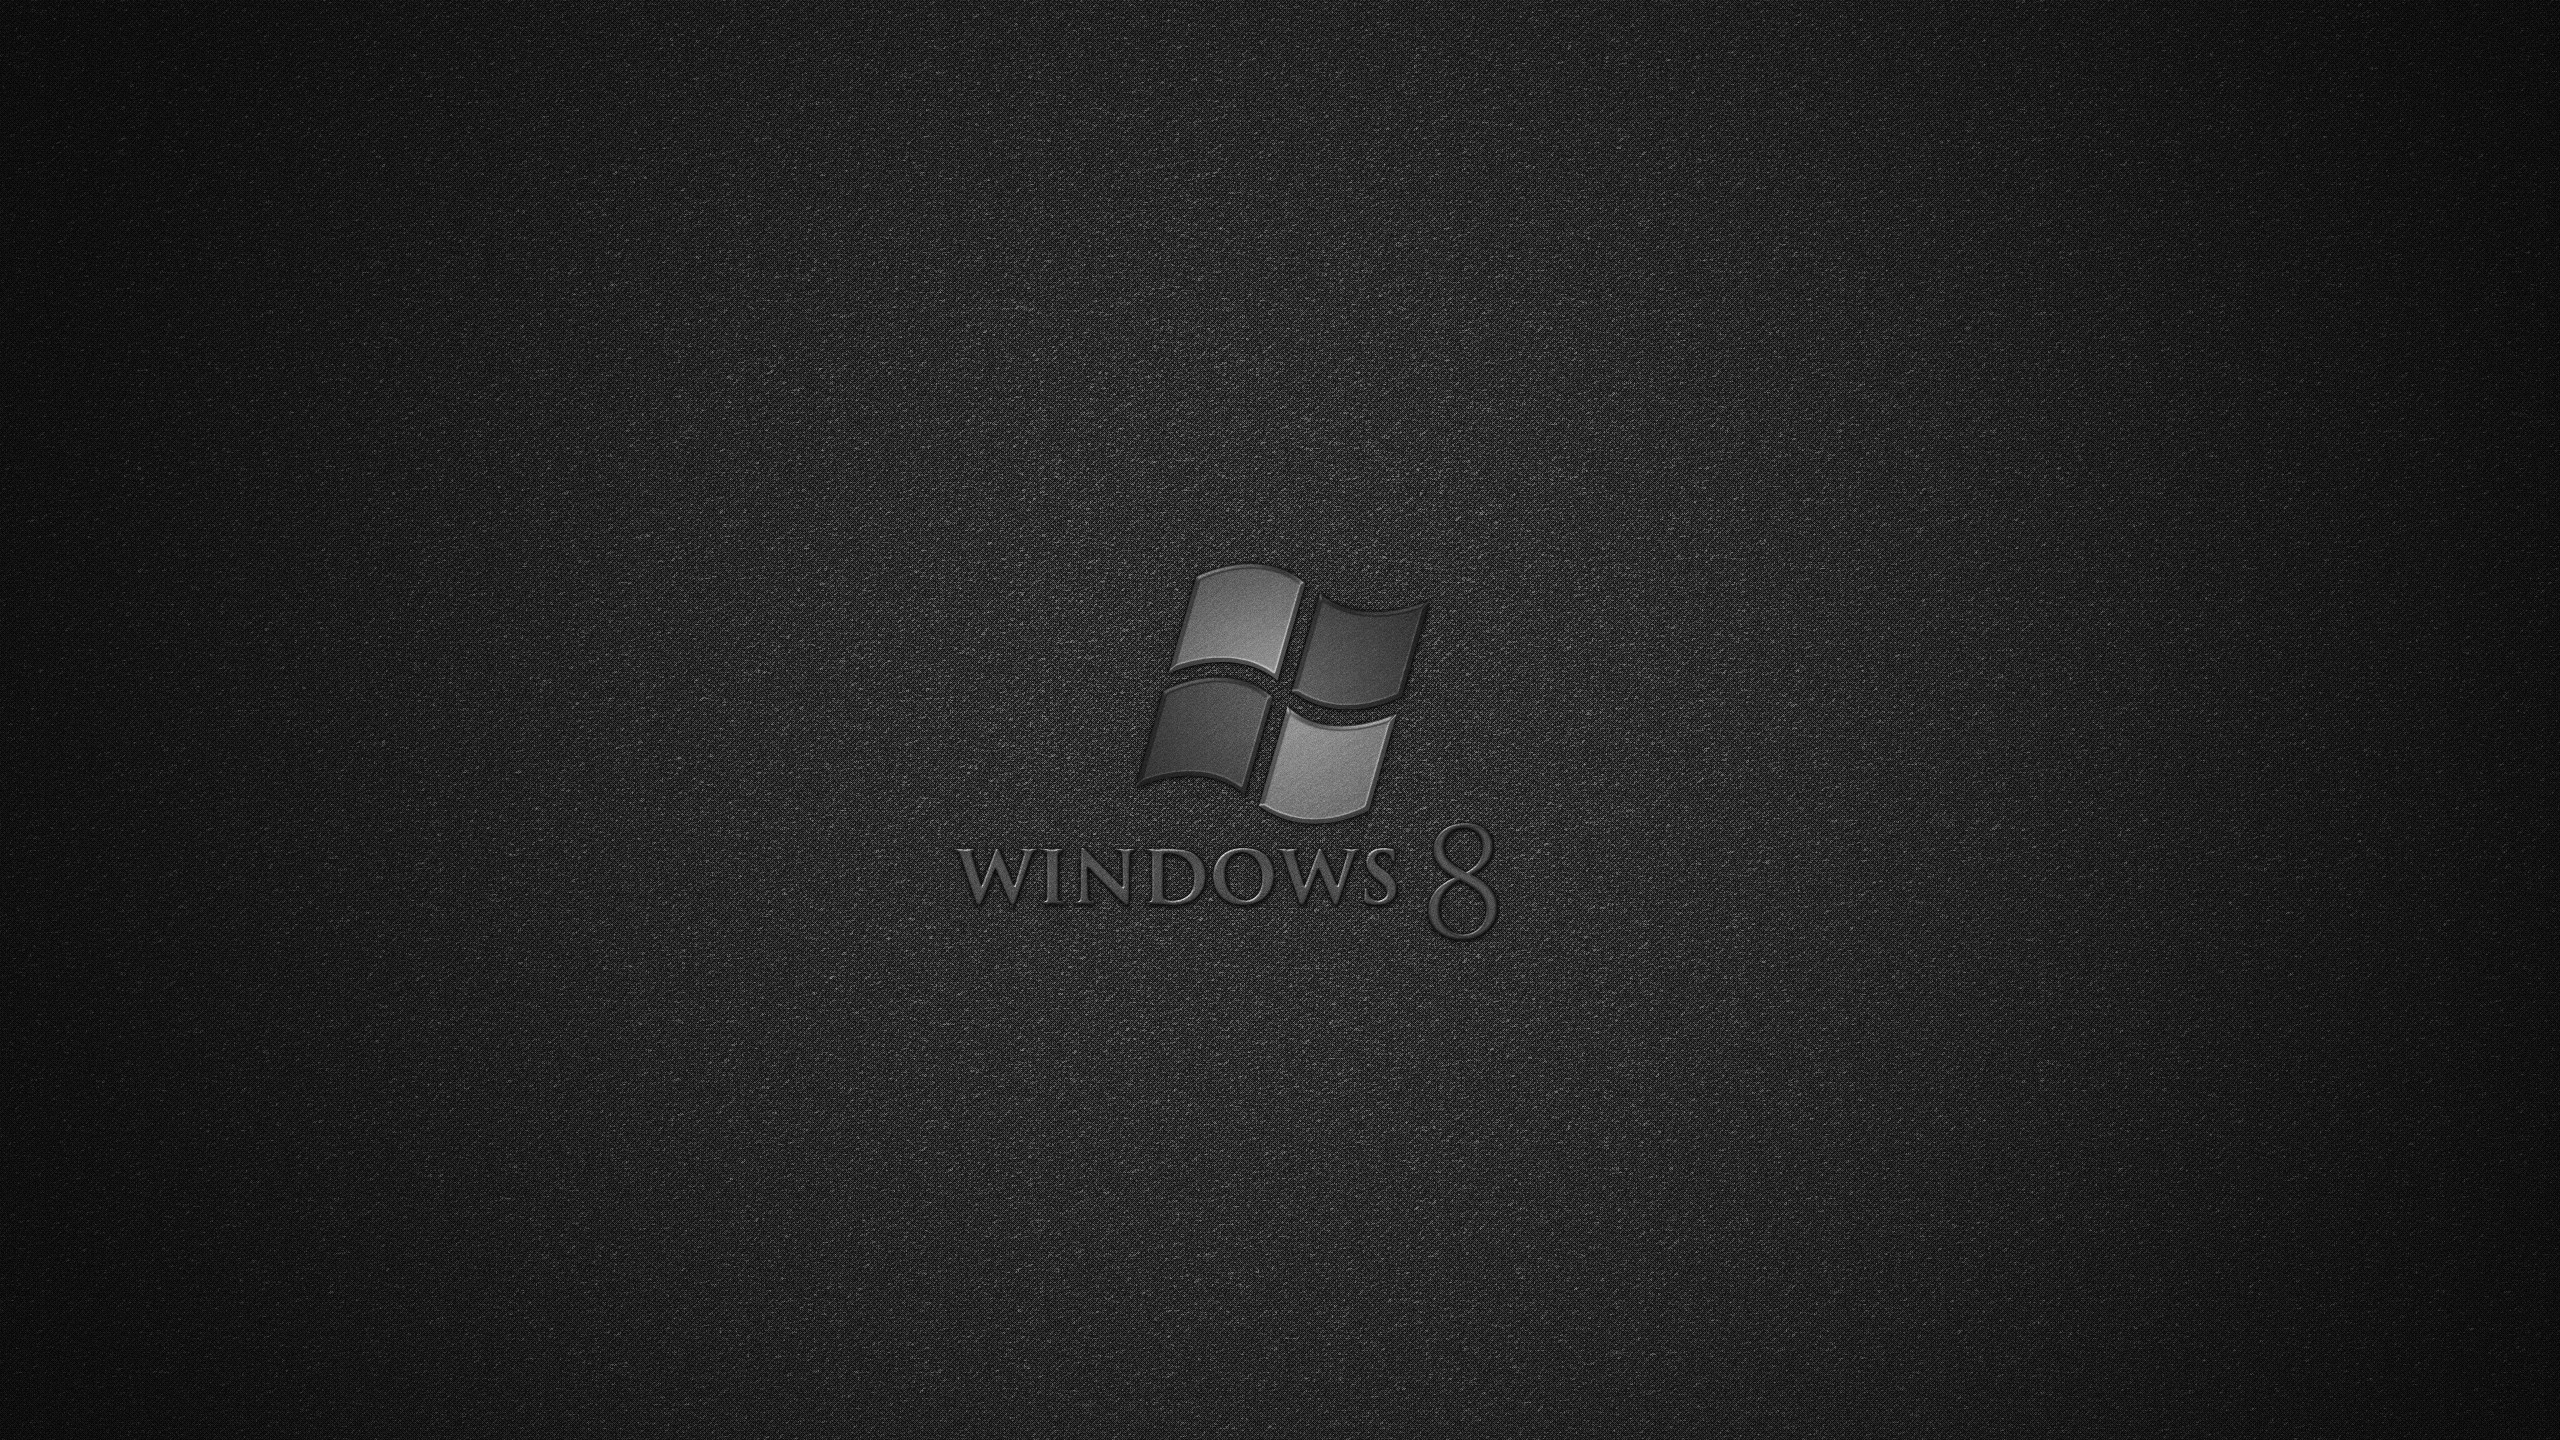 Windows8-Wallpapers-HD (8)